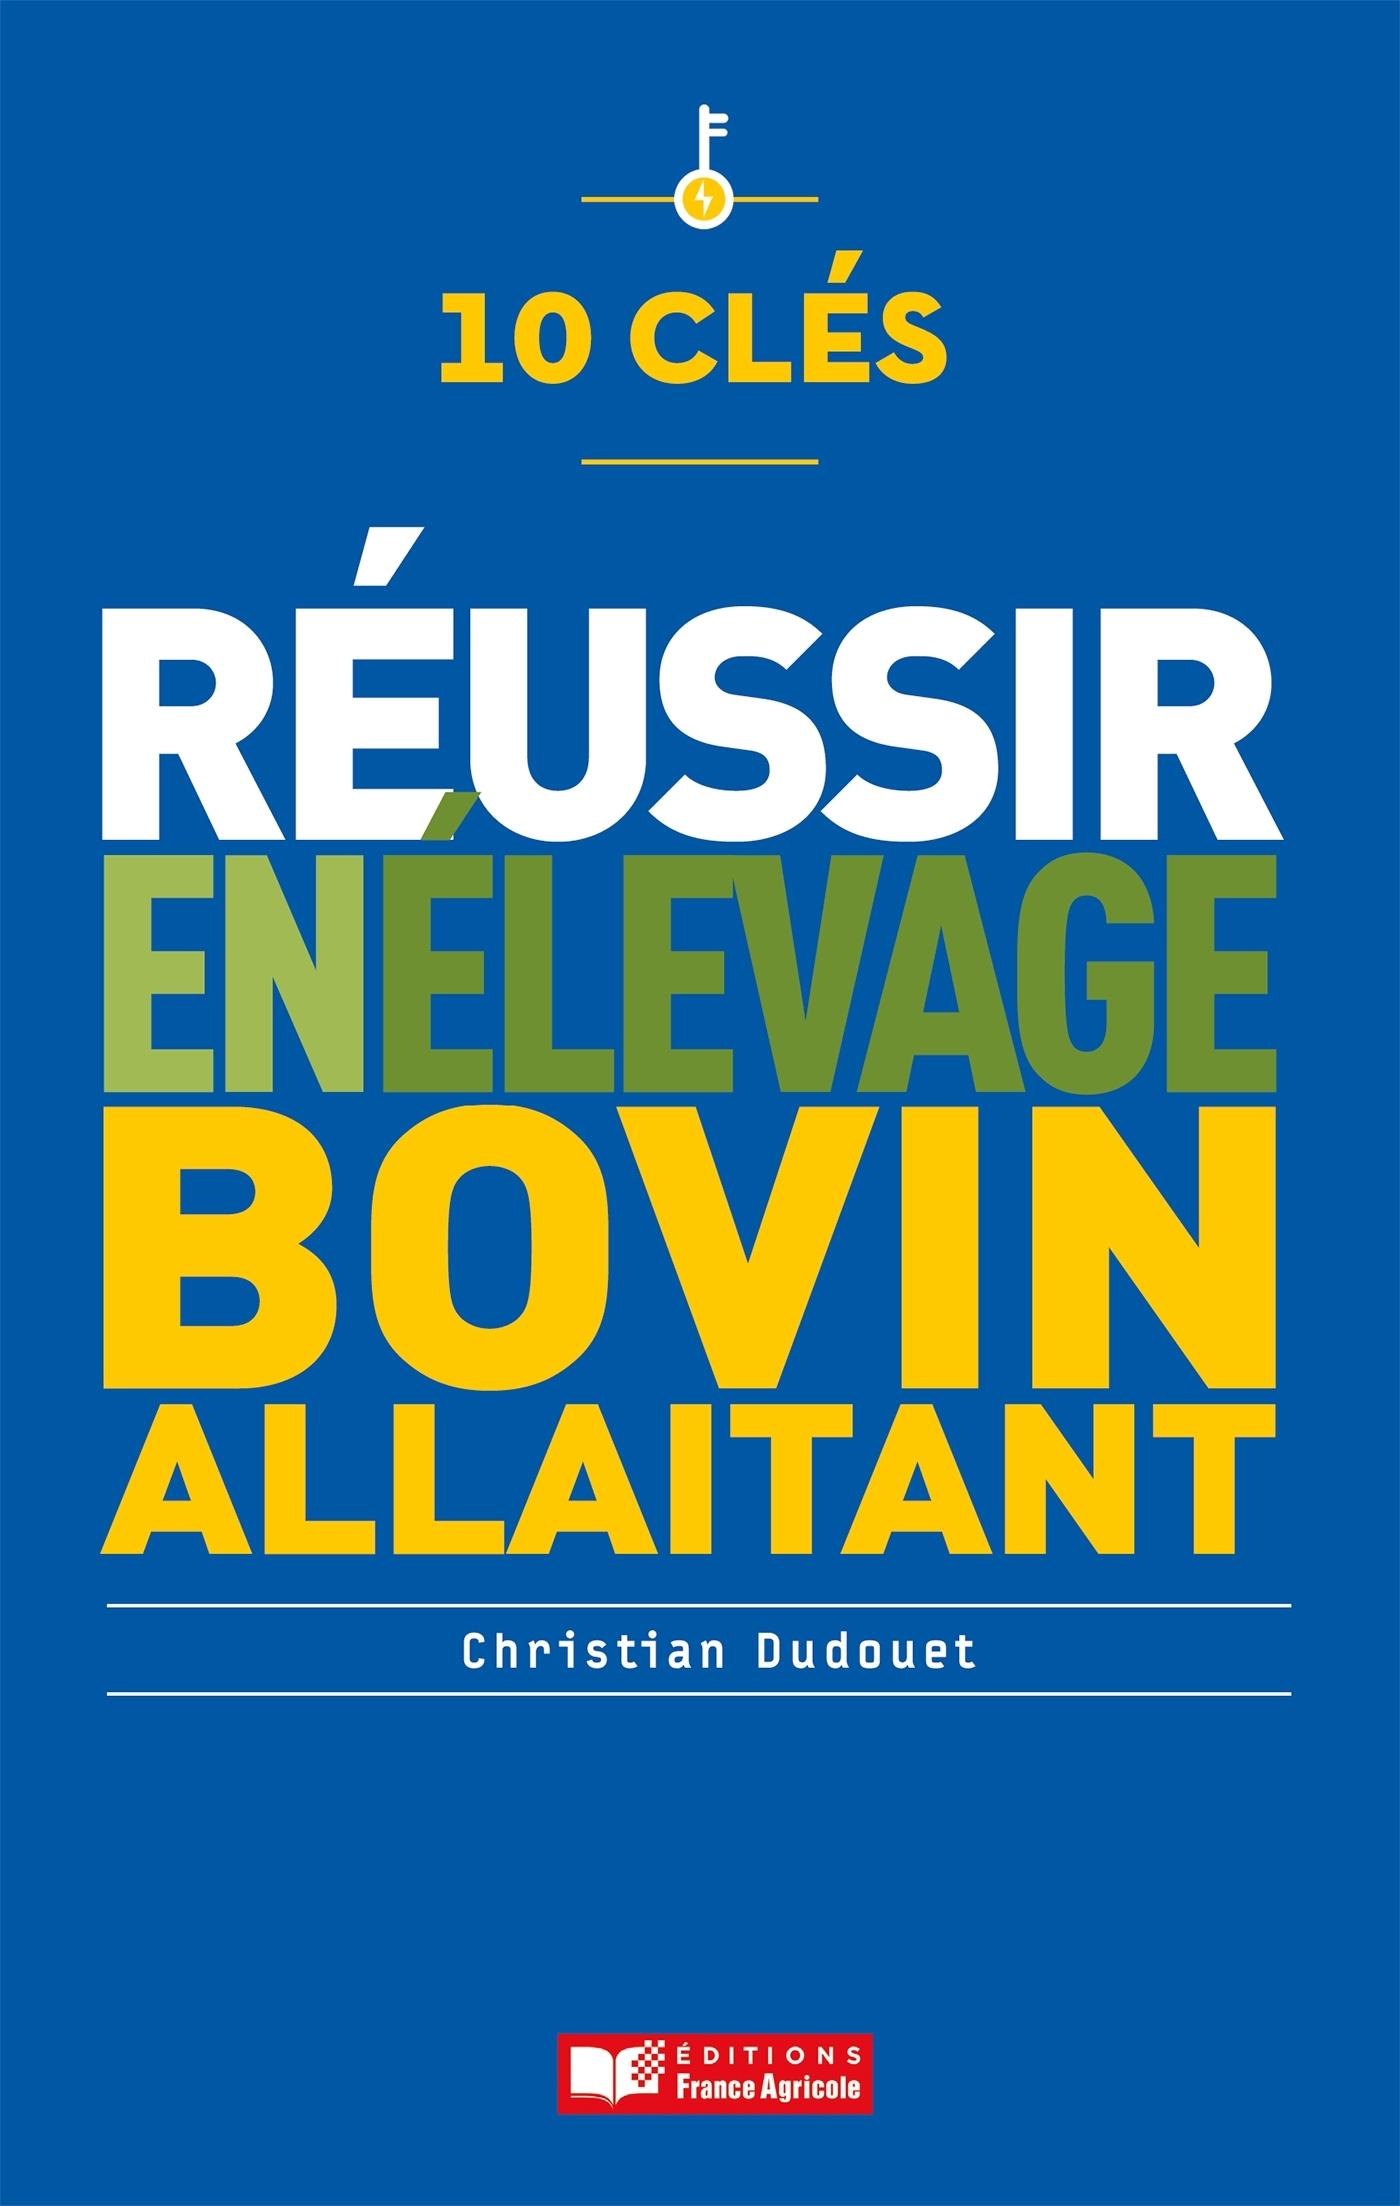 10 CLES POUR REUSSIR EN ELEVAGE BOVIN